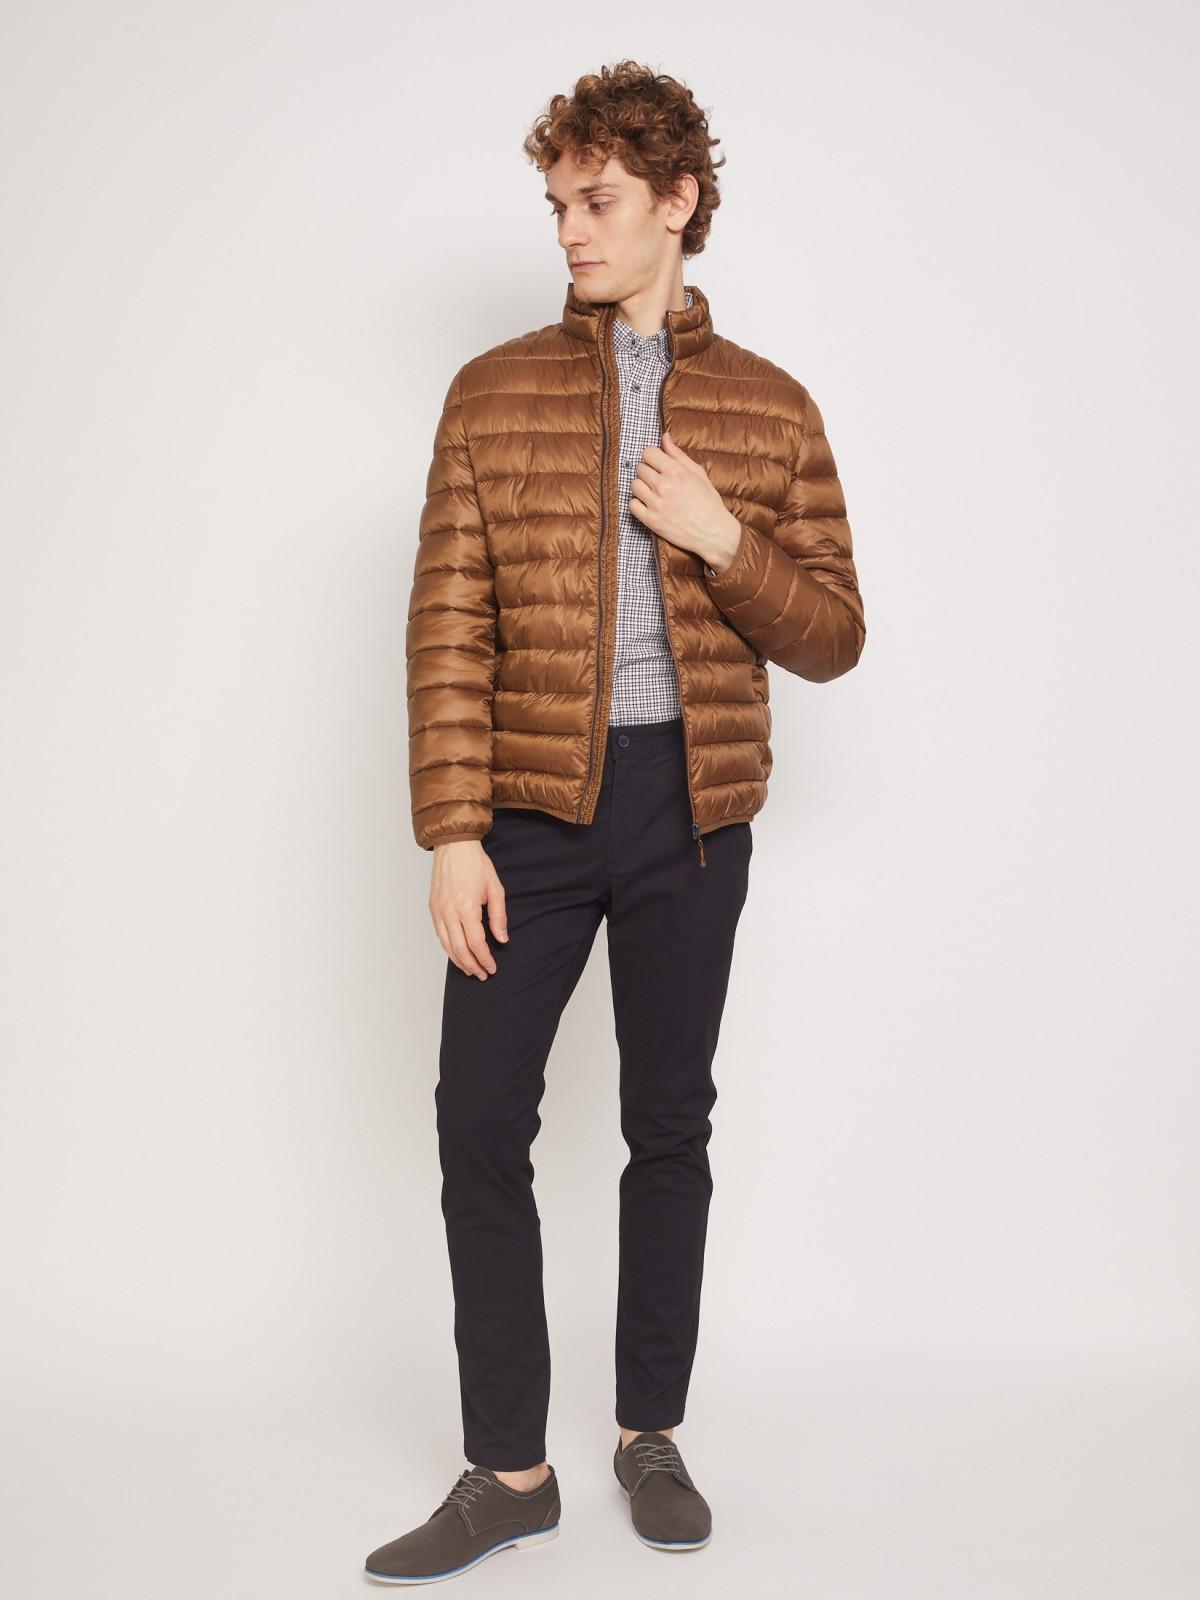 Куртка мужская Zolla z0113351022142500 коричневая S, z0113351022142500